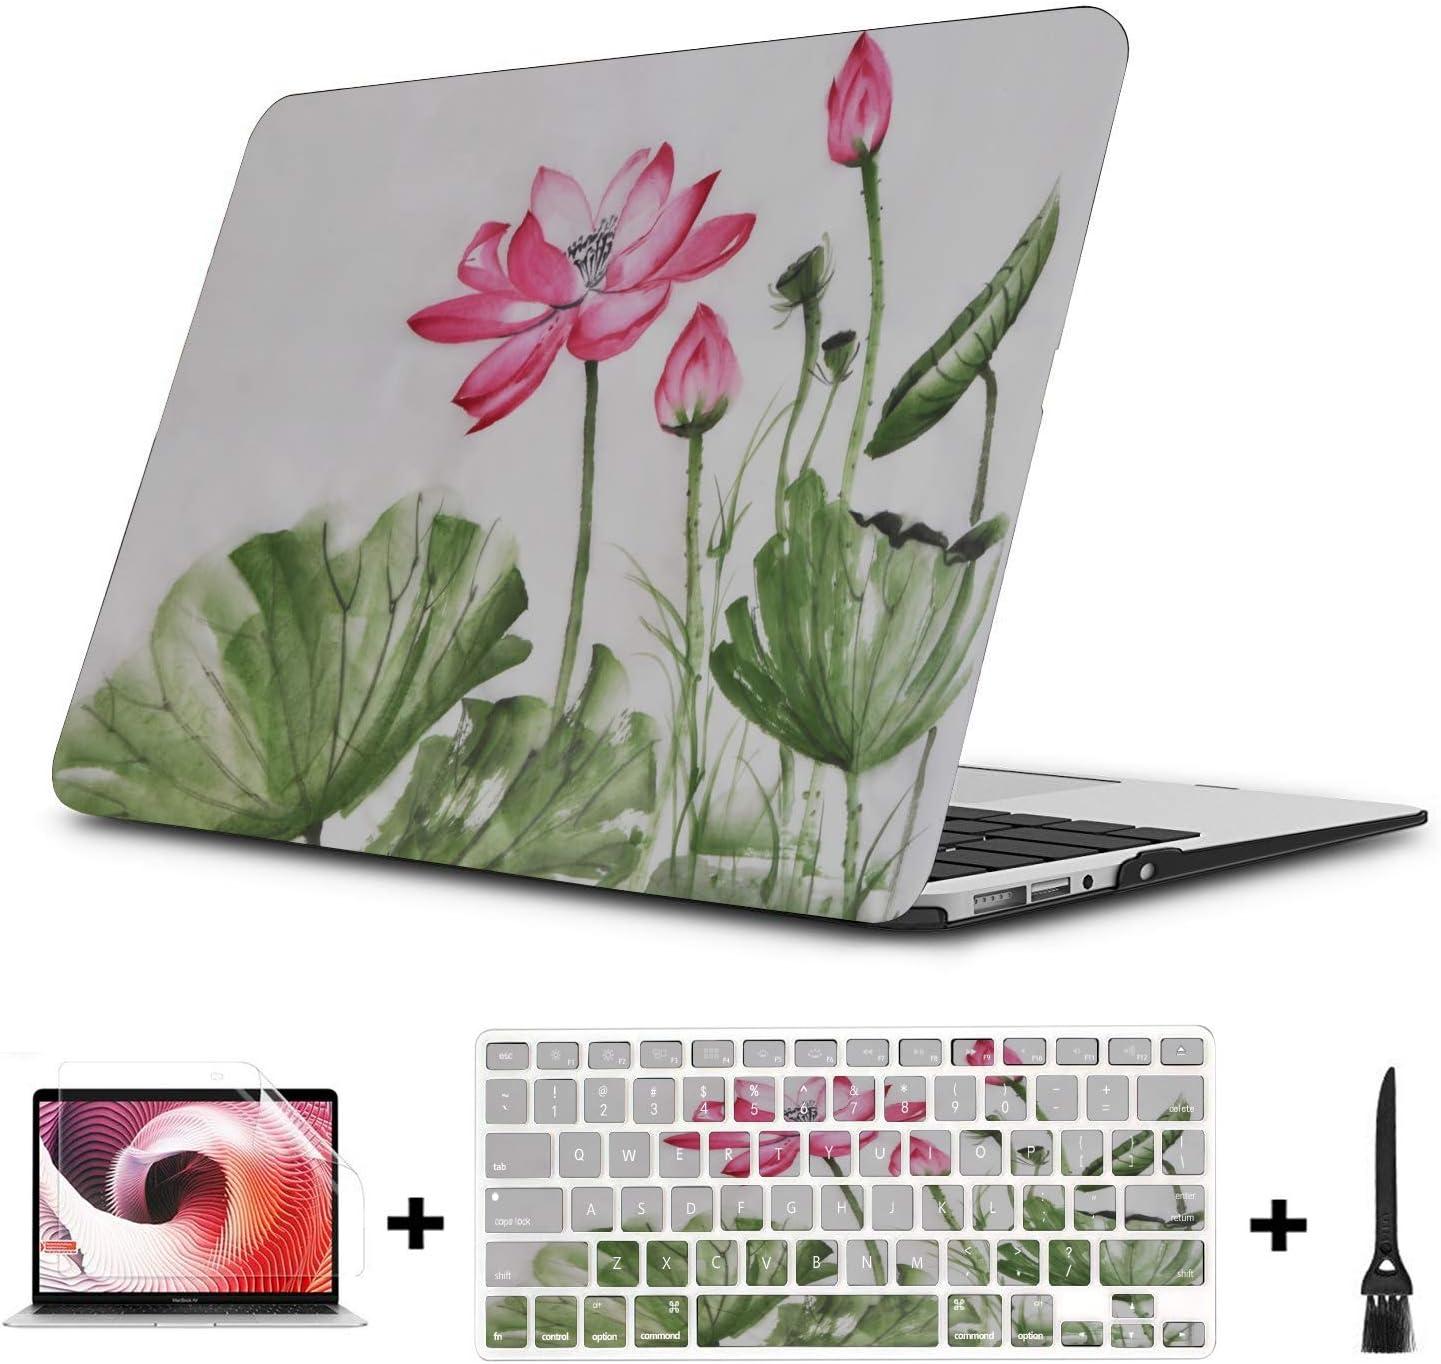 MacBook Accessories Summer Hangzhou Western Lake Lotus Plastic Hard Shell Compatible Mac Air 11 Pro 13 15 MacBook Accessories Case Protection for MacBook 2016-2019 Version